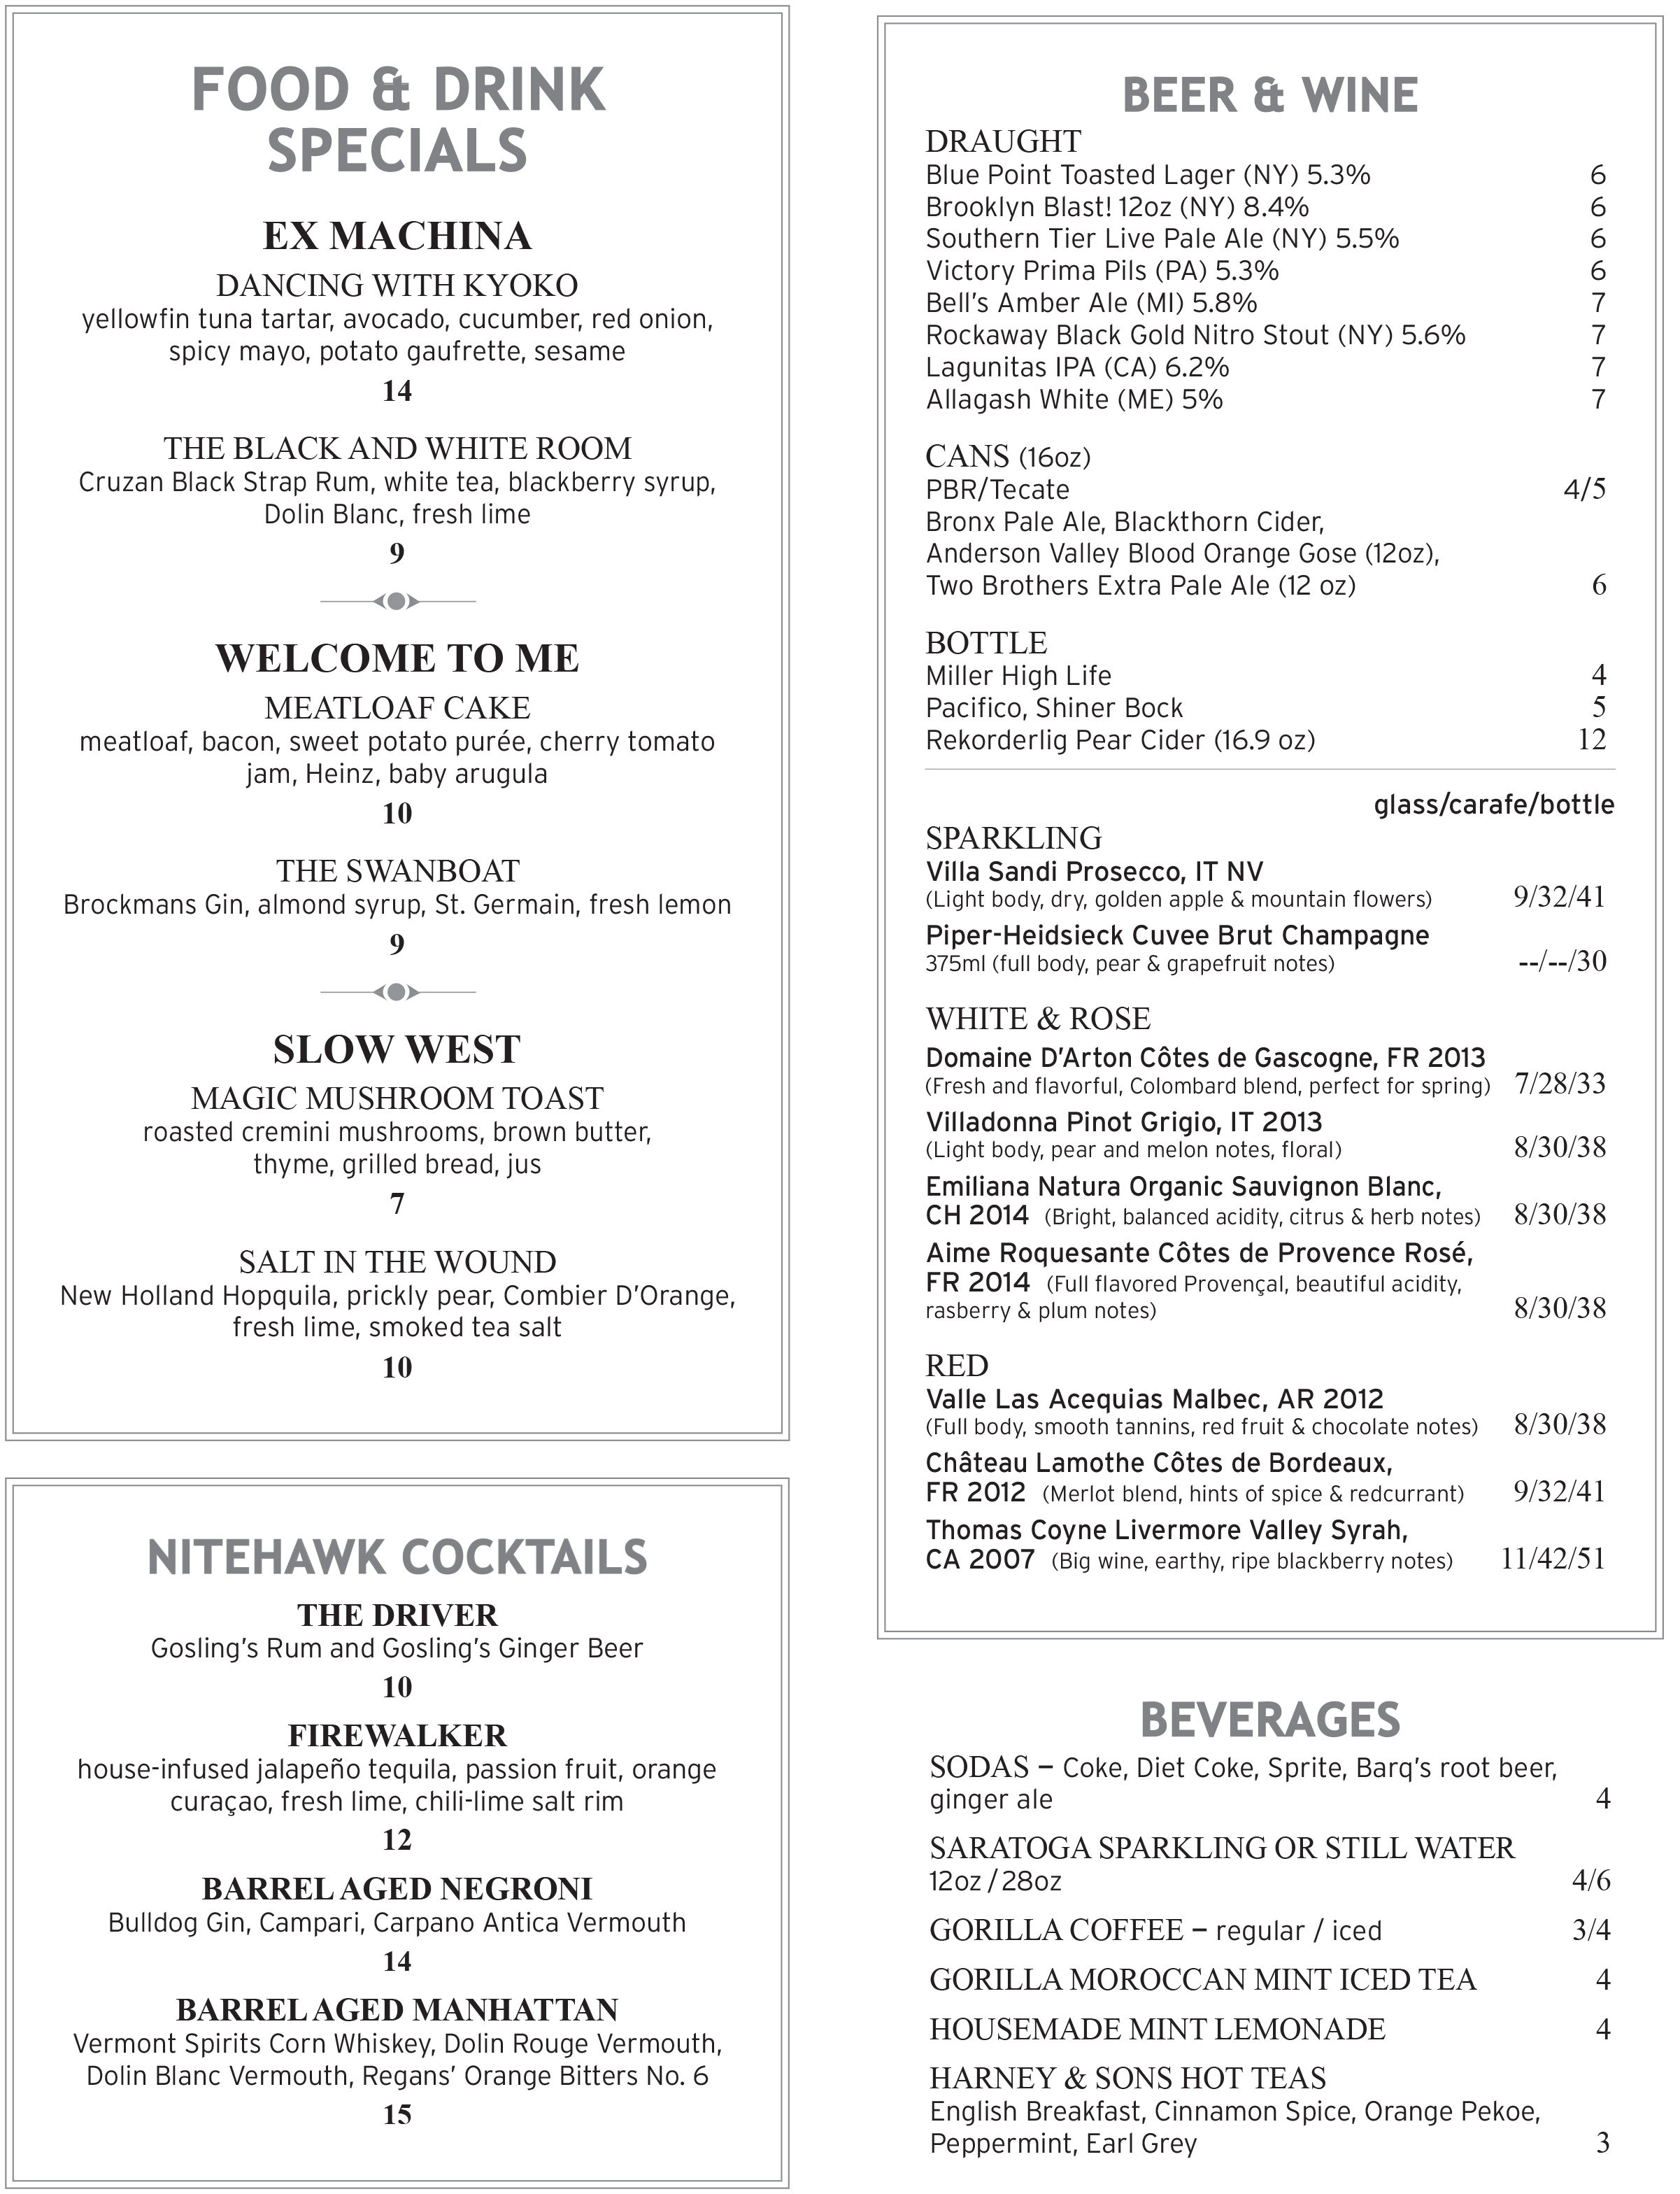 NH_Dinner menu 5.22.15-1